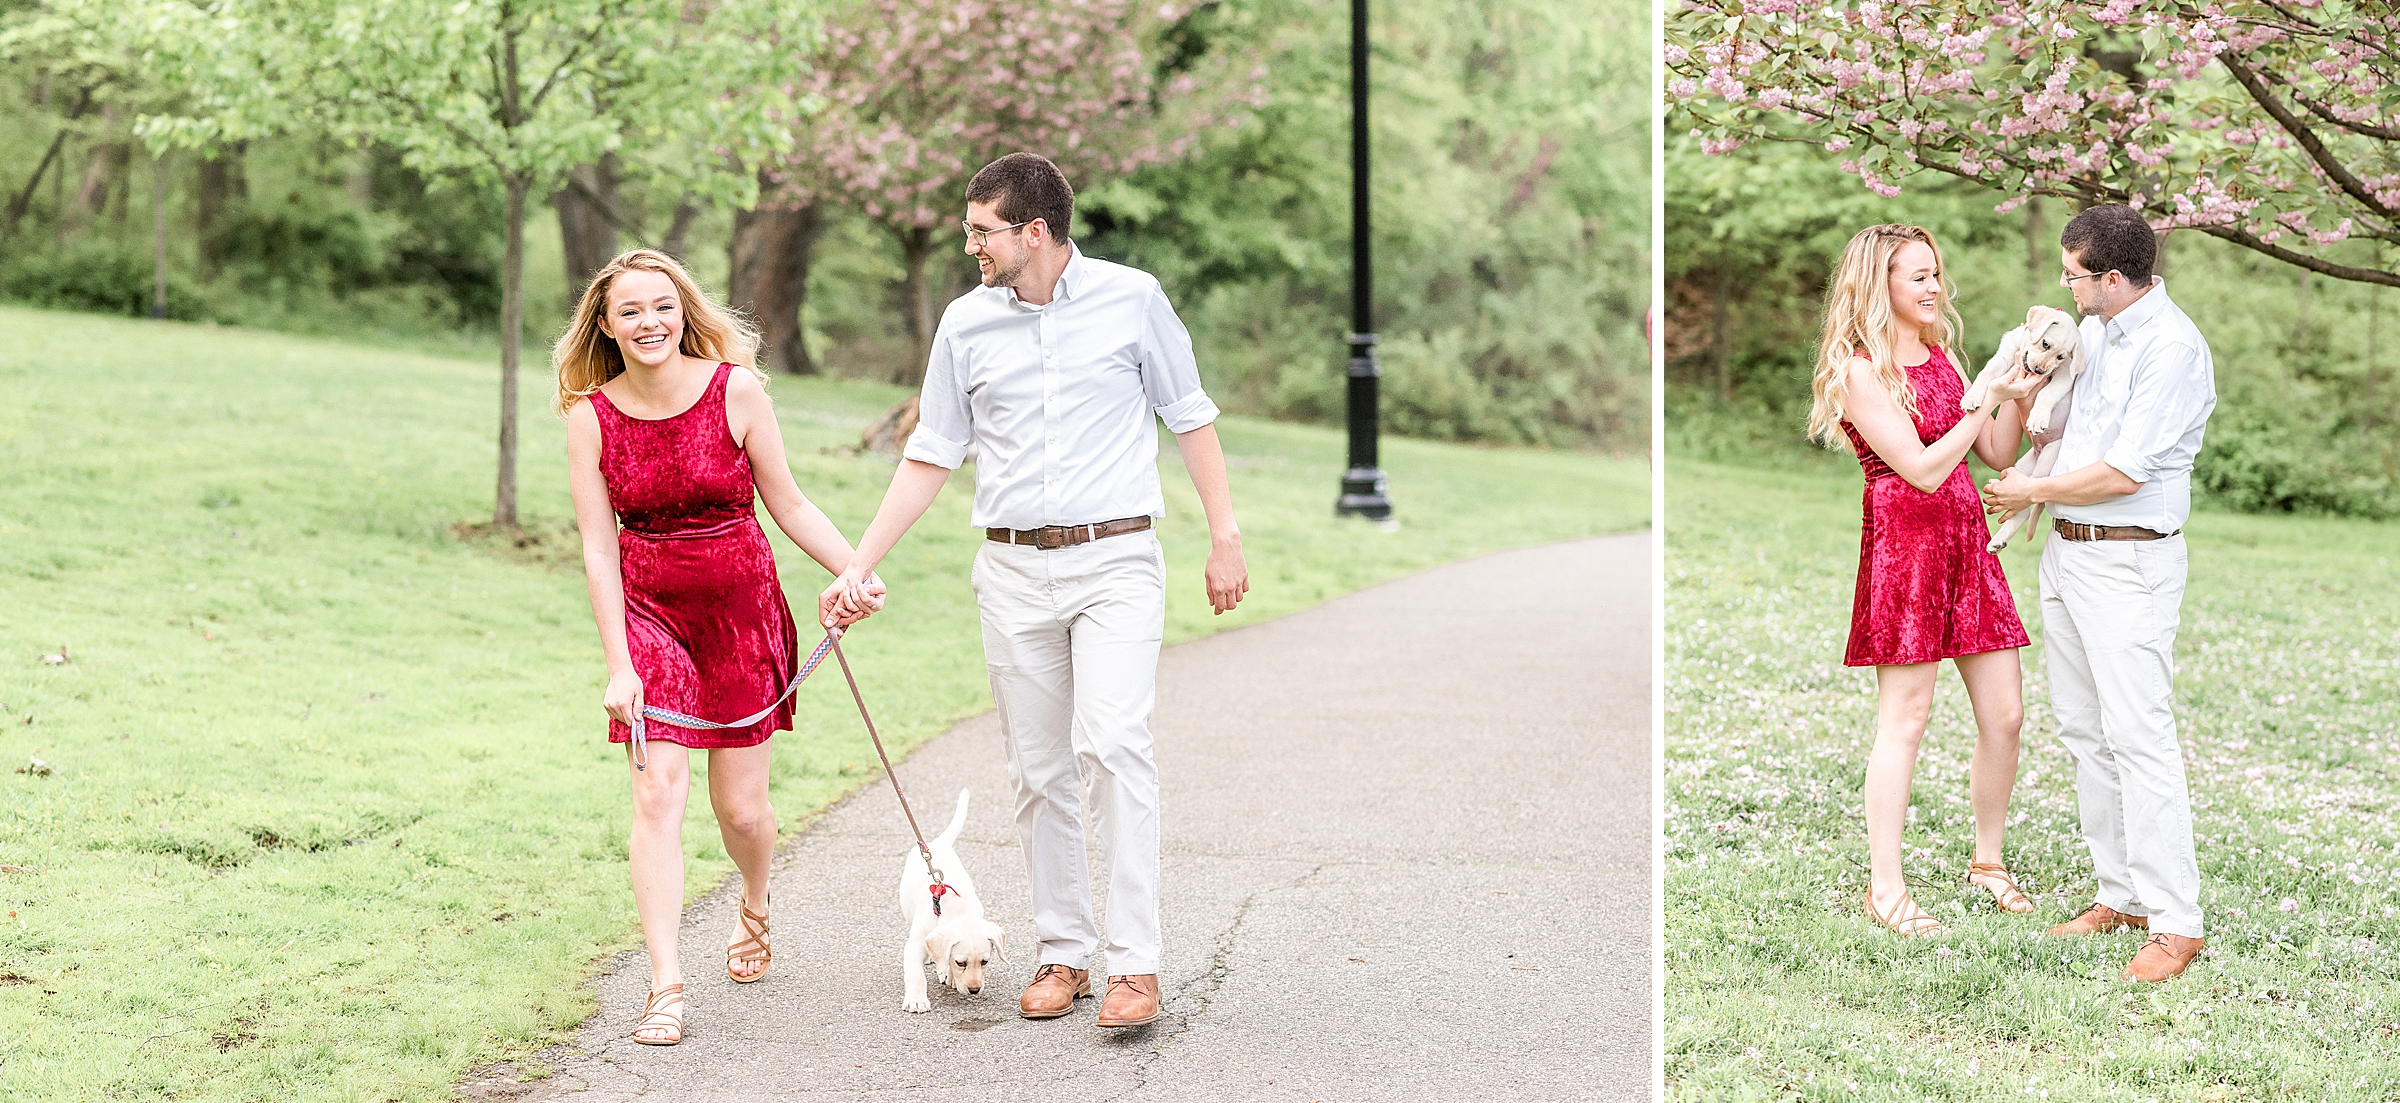 Couple walking their dog in Verona Park in NJ